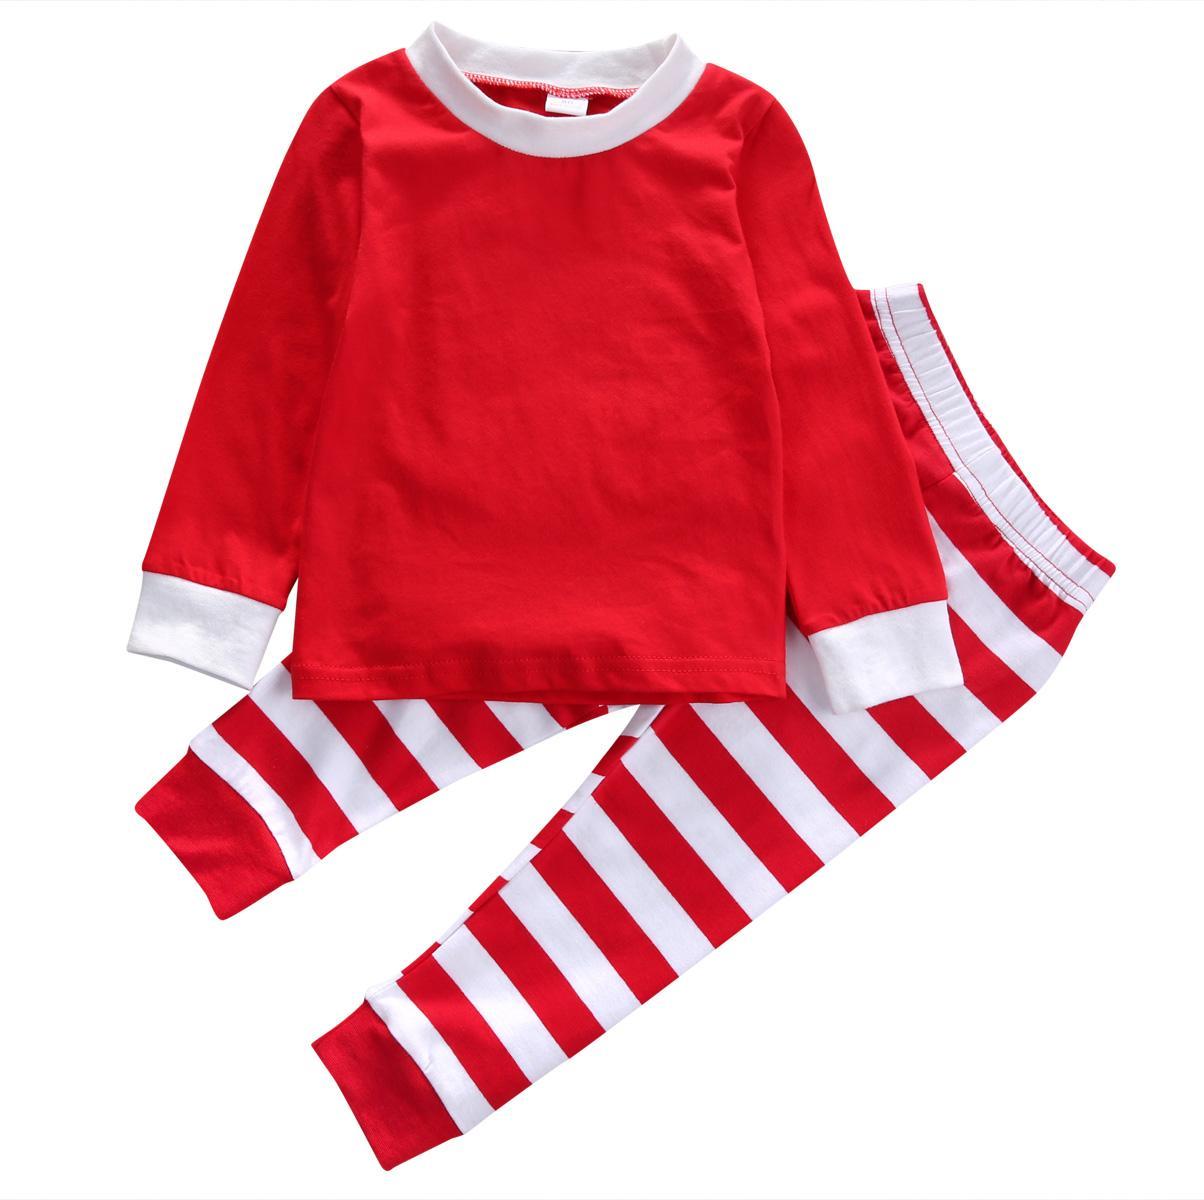 deb6dcf54544 Christmas Pajama Sets Toddler Kids Baby Boy Girls Striped Outfits ...